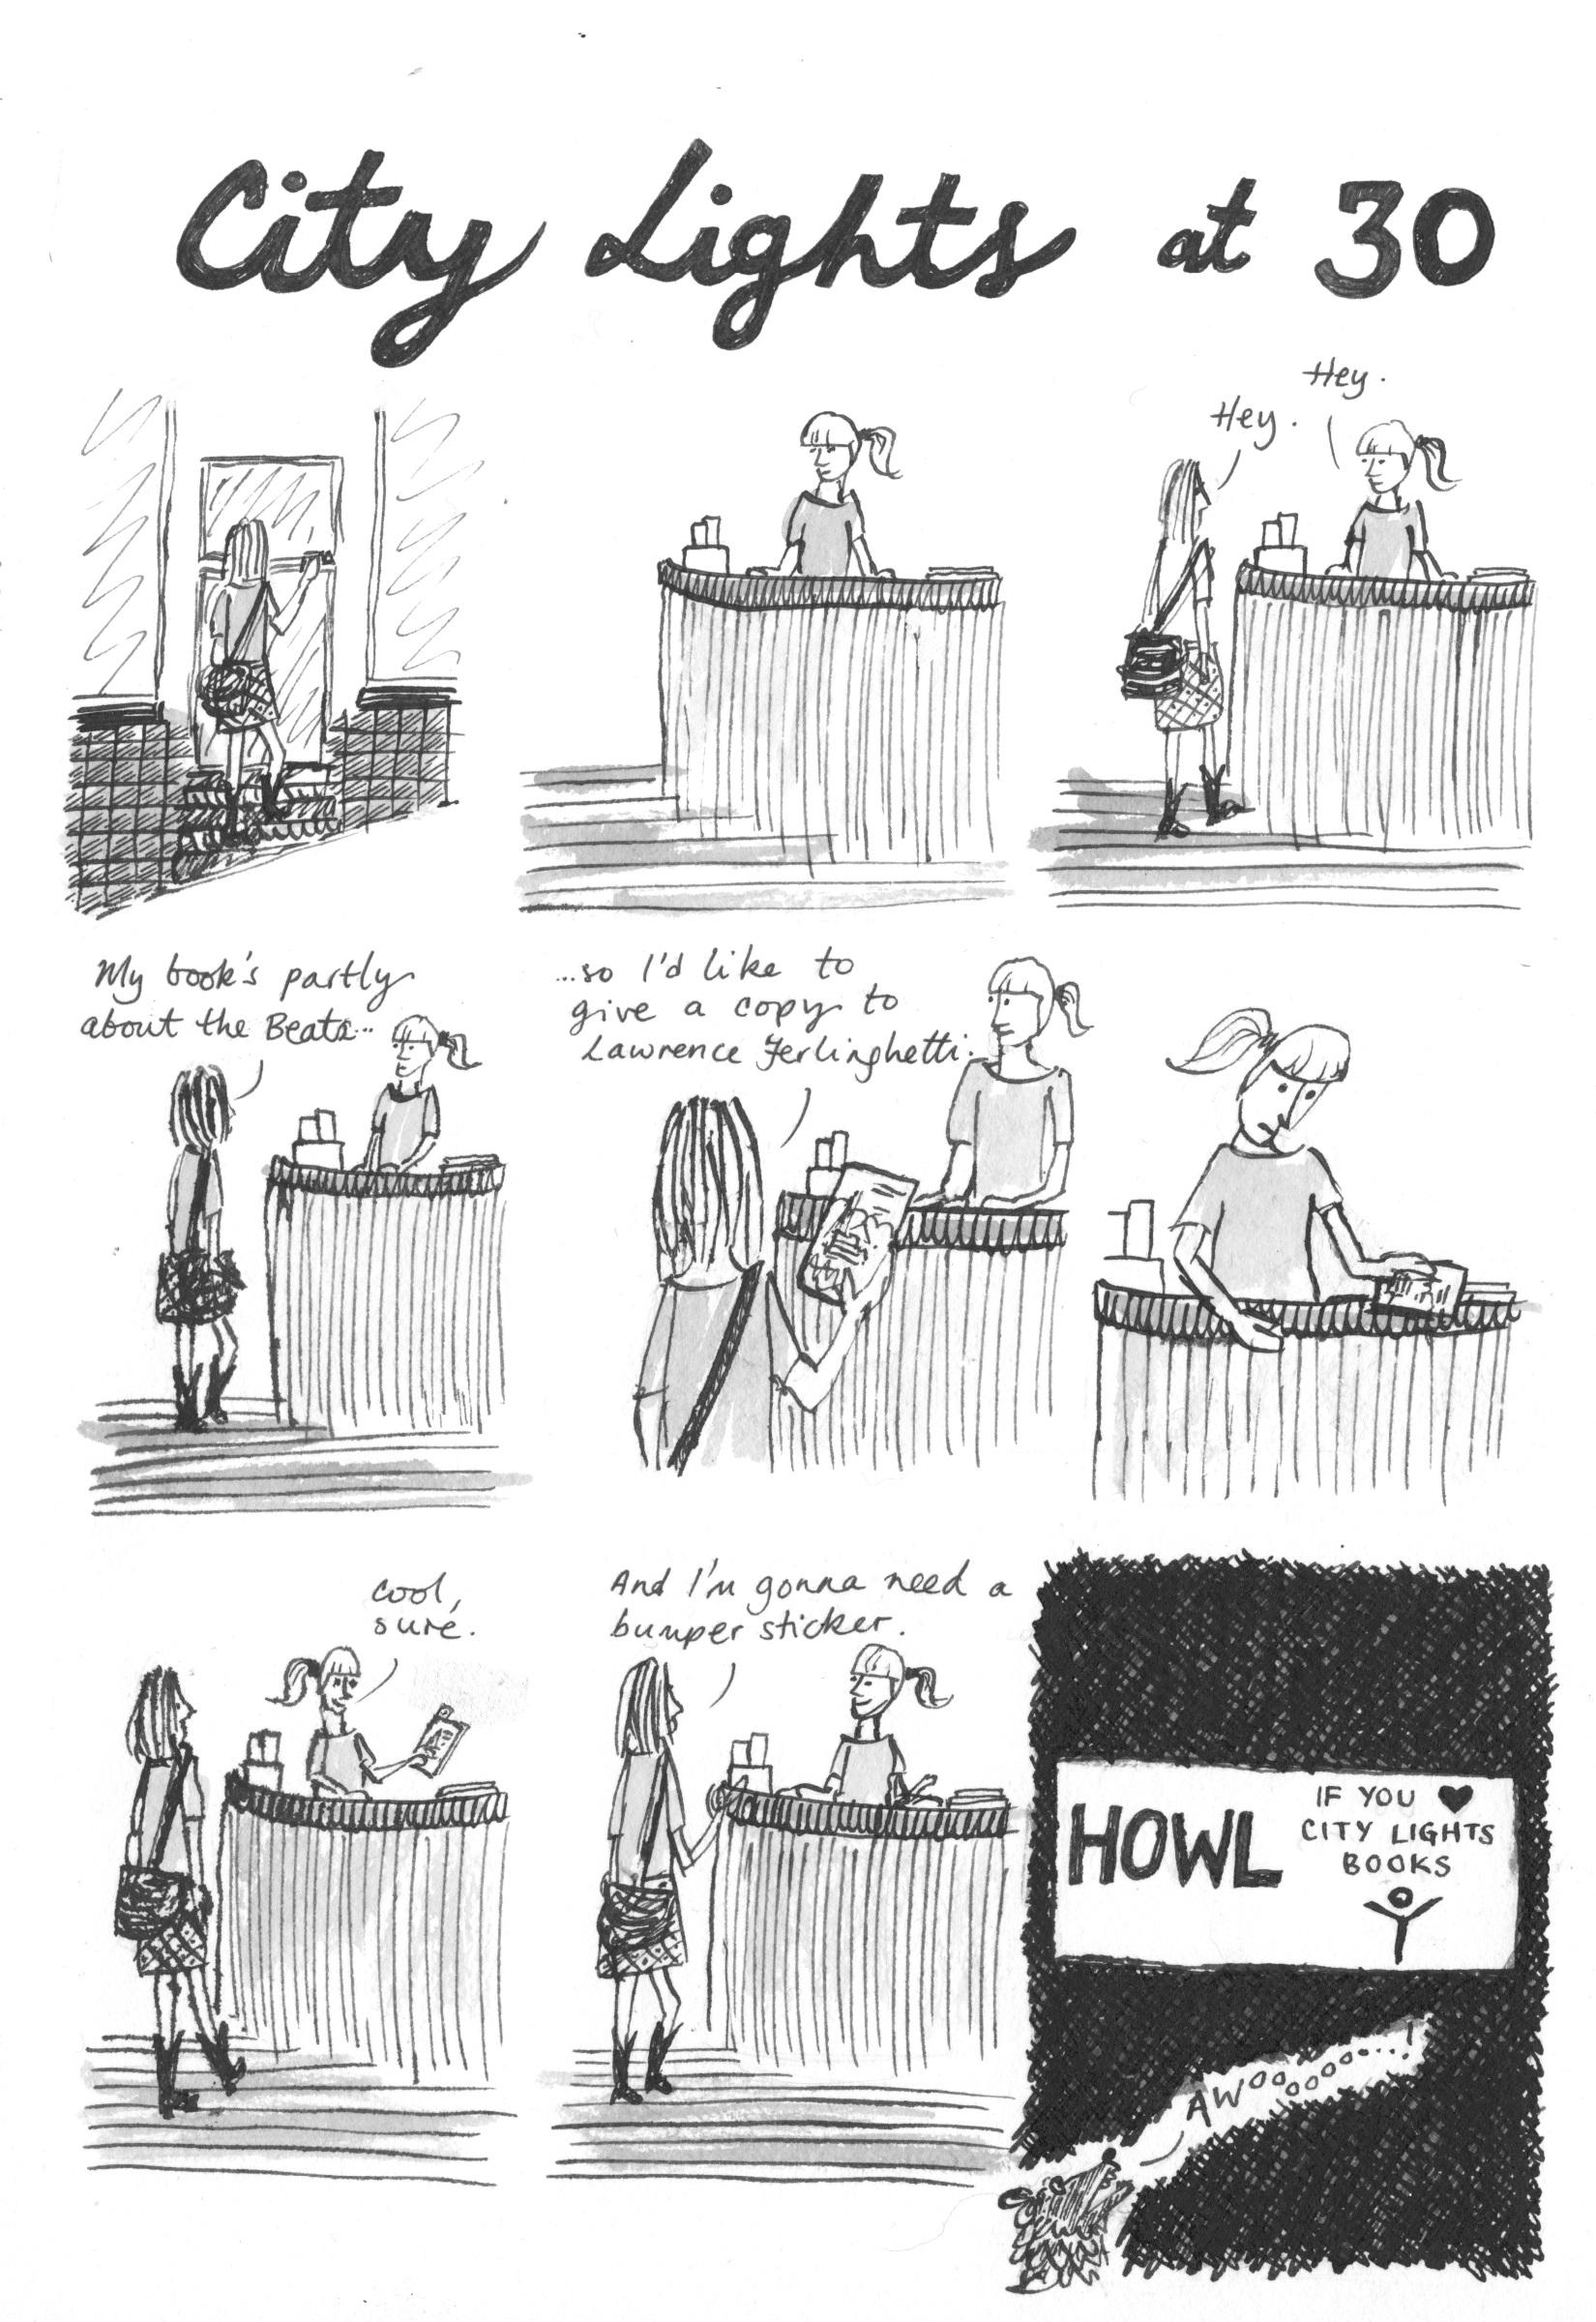 Comic: City Lights at 30